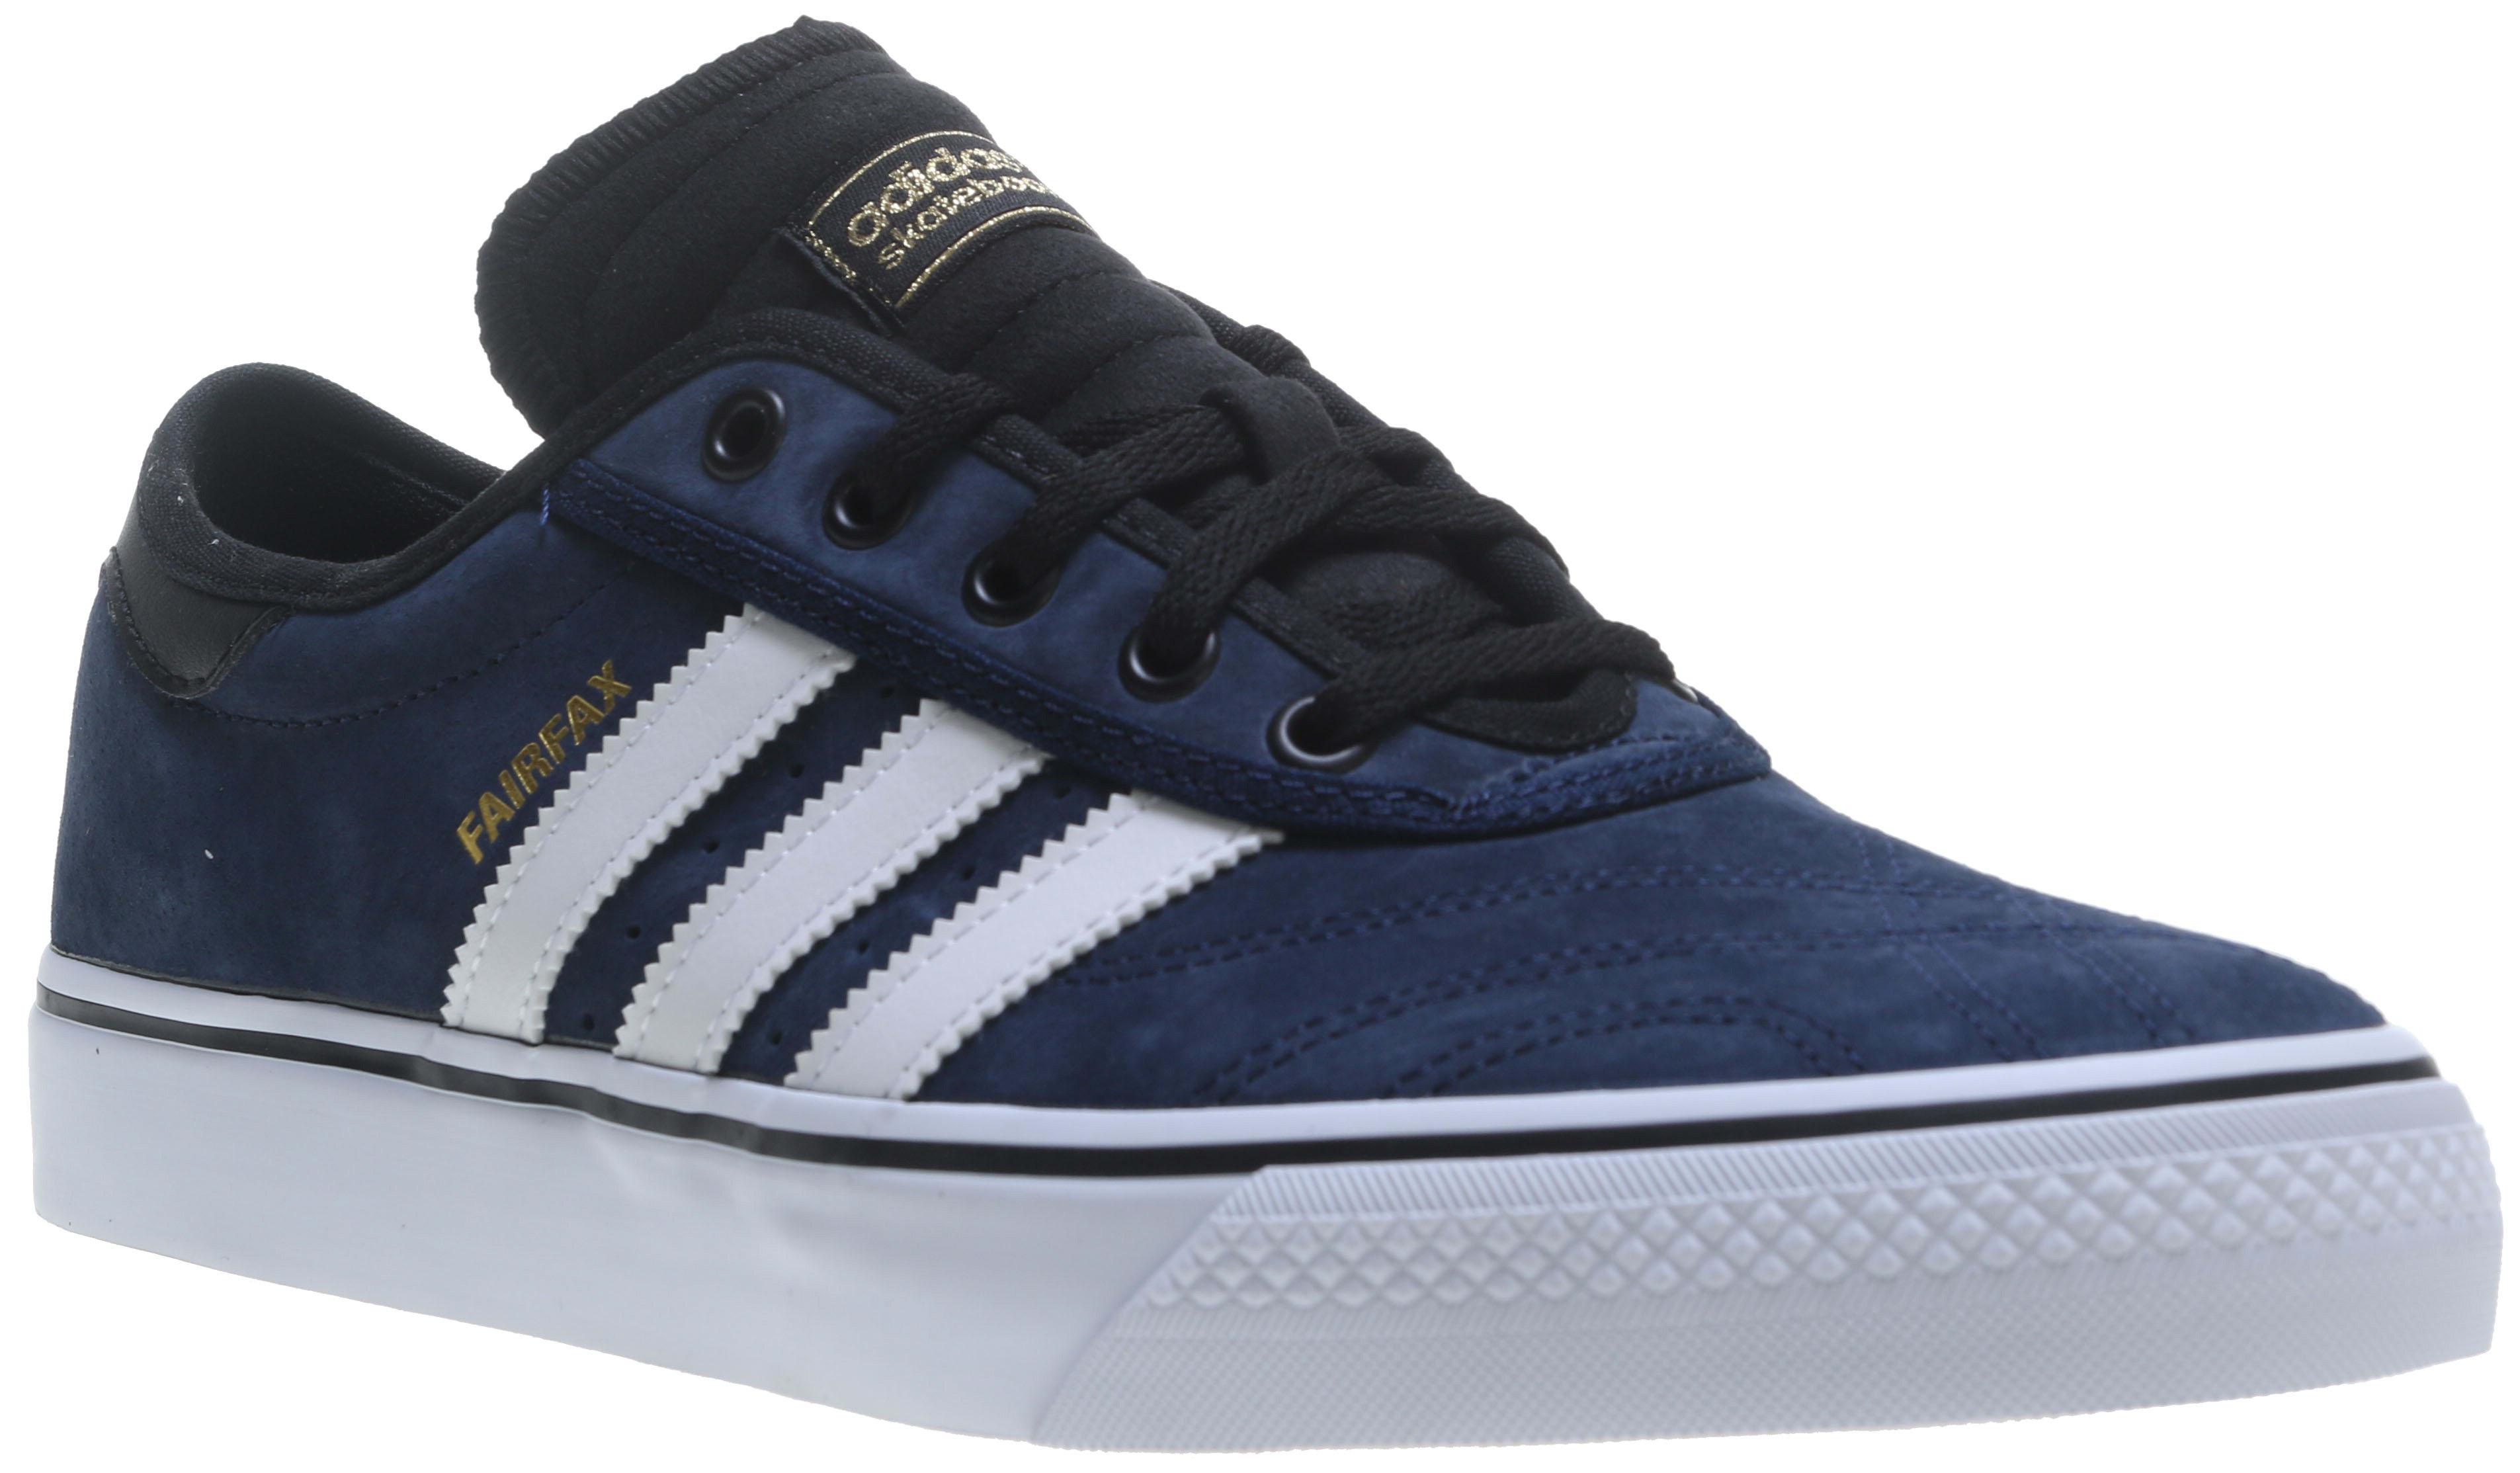 the latest 63a51 3f018 Adidas Adi-Ease Premiere - Fairfax Skate Shoes - thumbnail 2